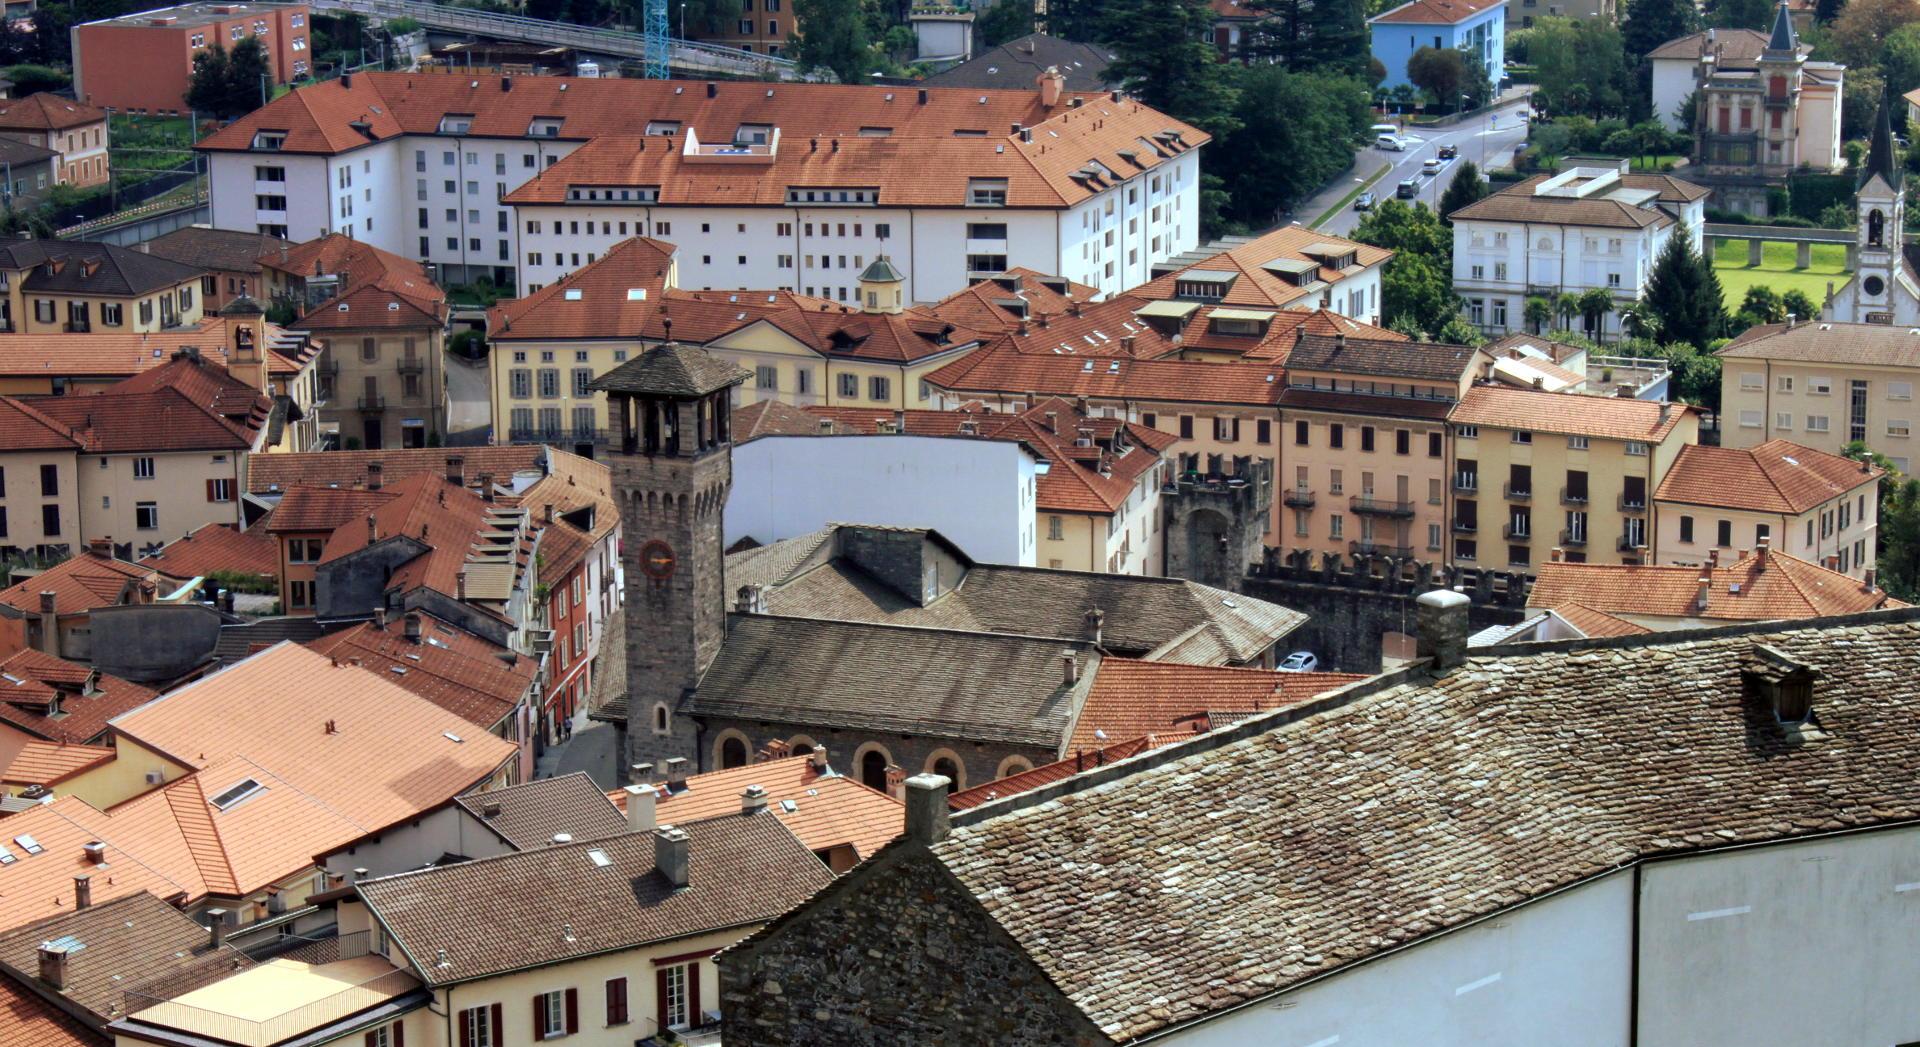 widok na miasto: Bellinzona iglawpodrozy